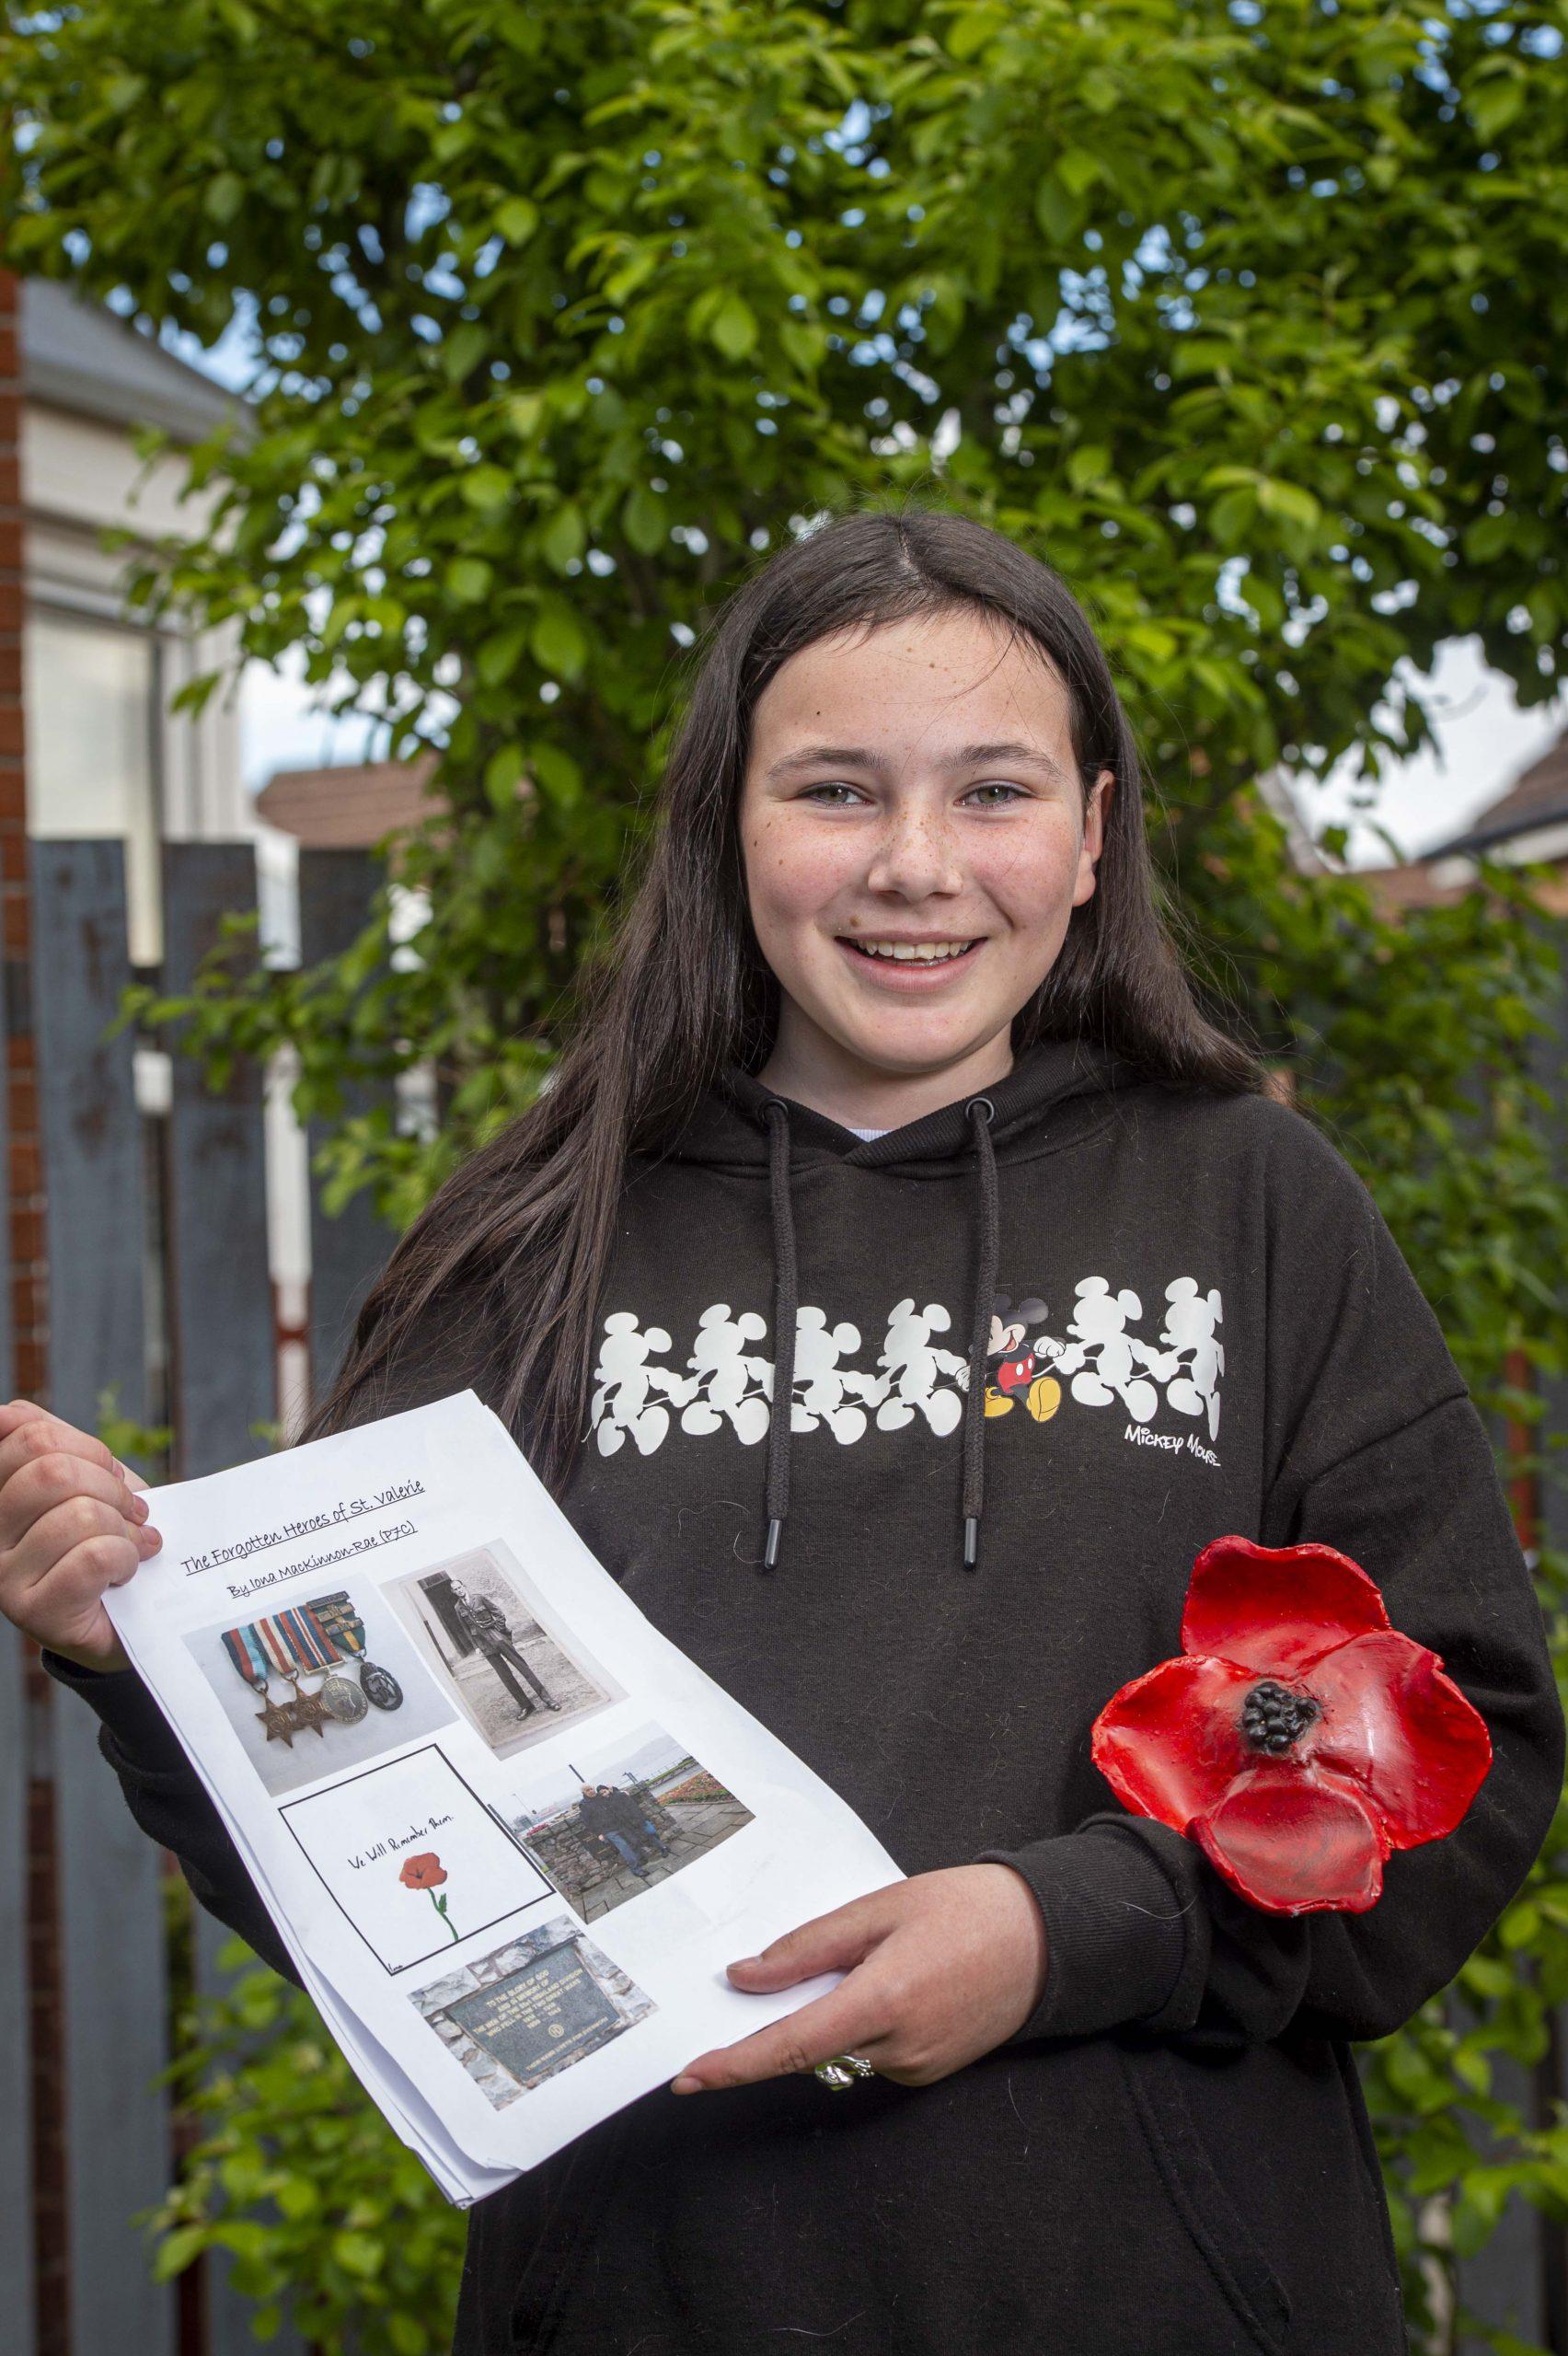 PoppyScotland_St Valery learning_Iona Mackinnon-Rae - Education News Scotland